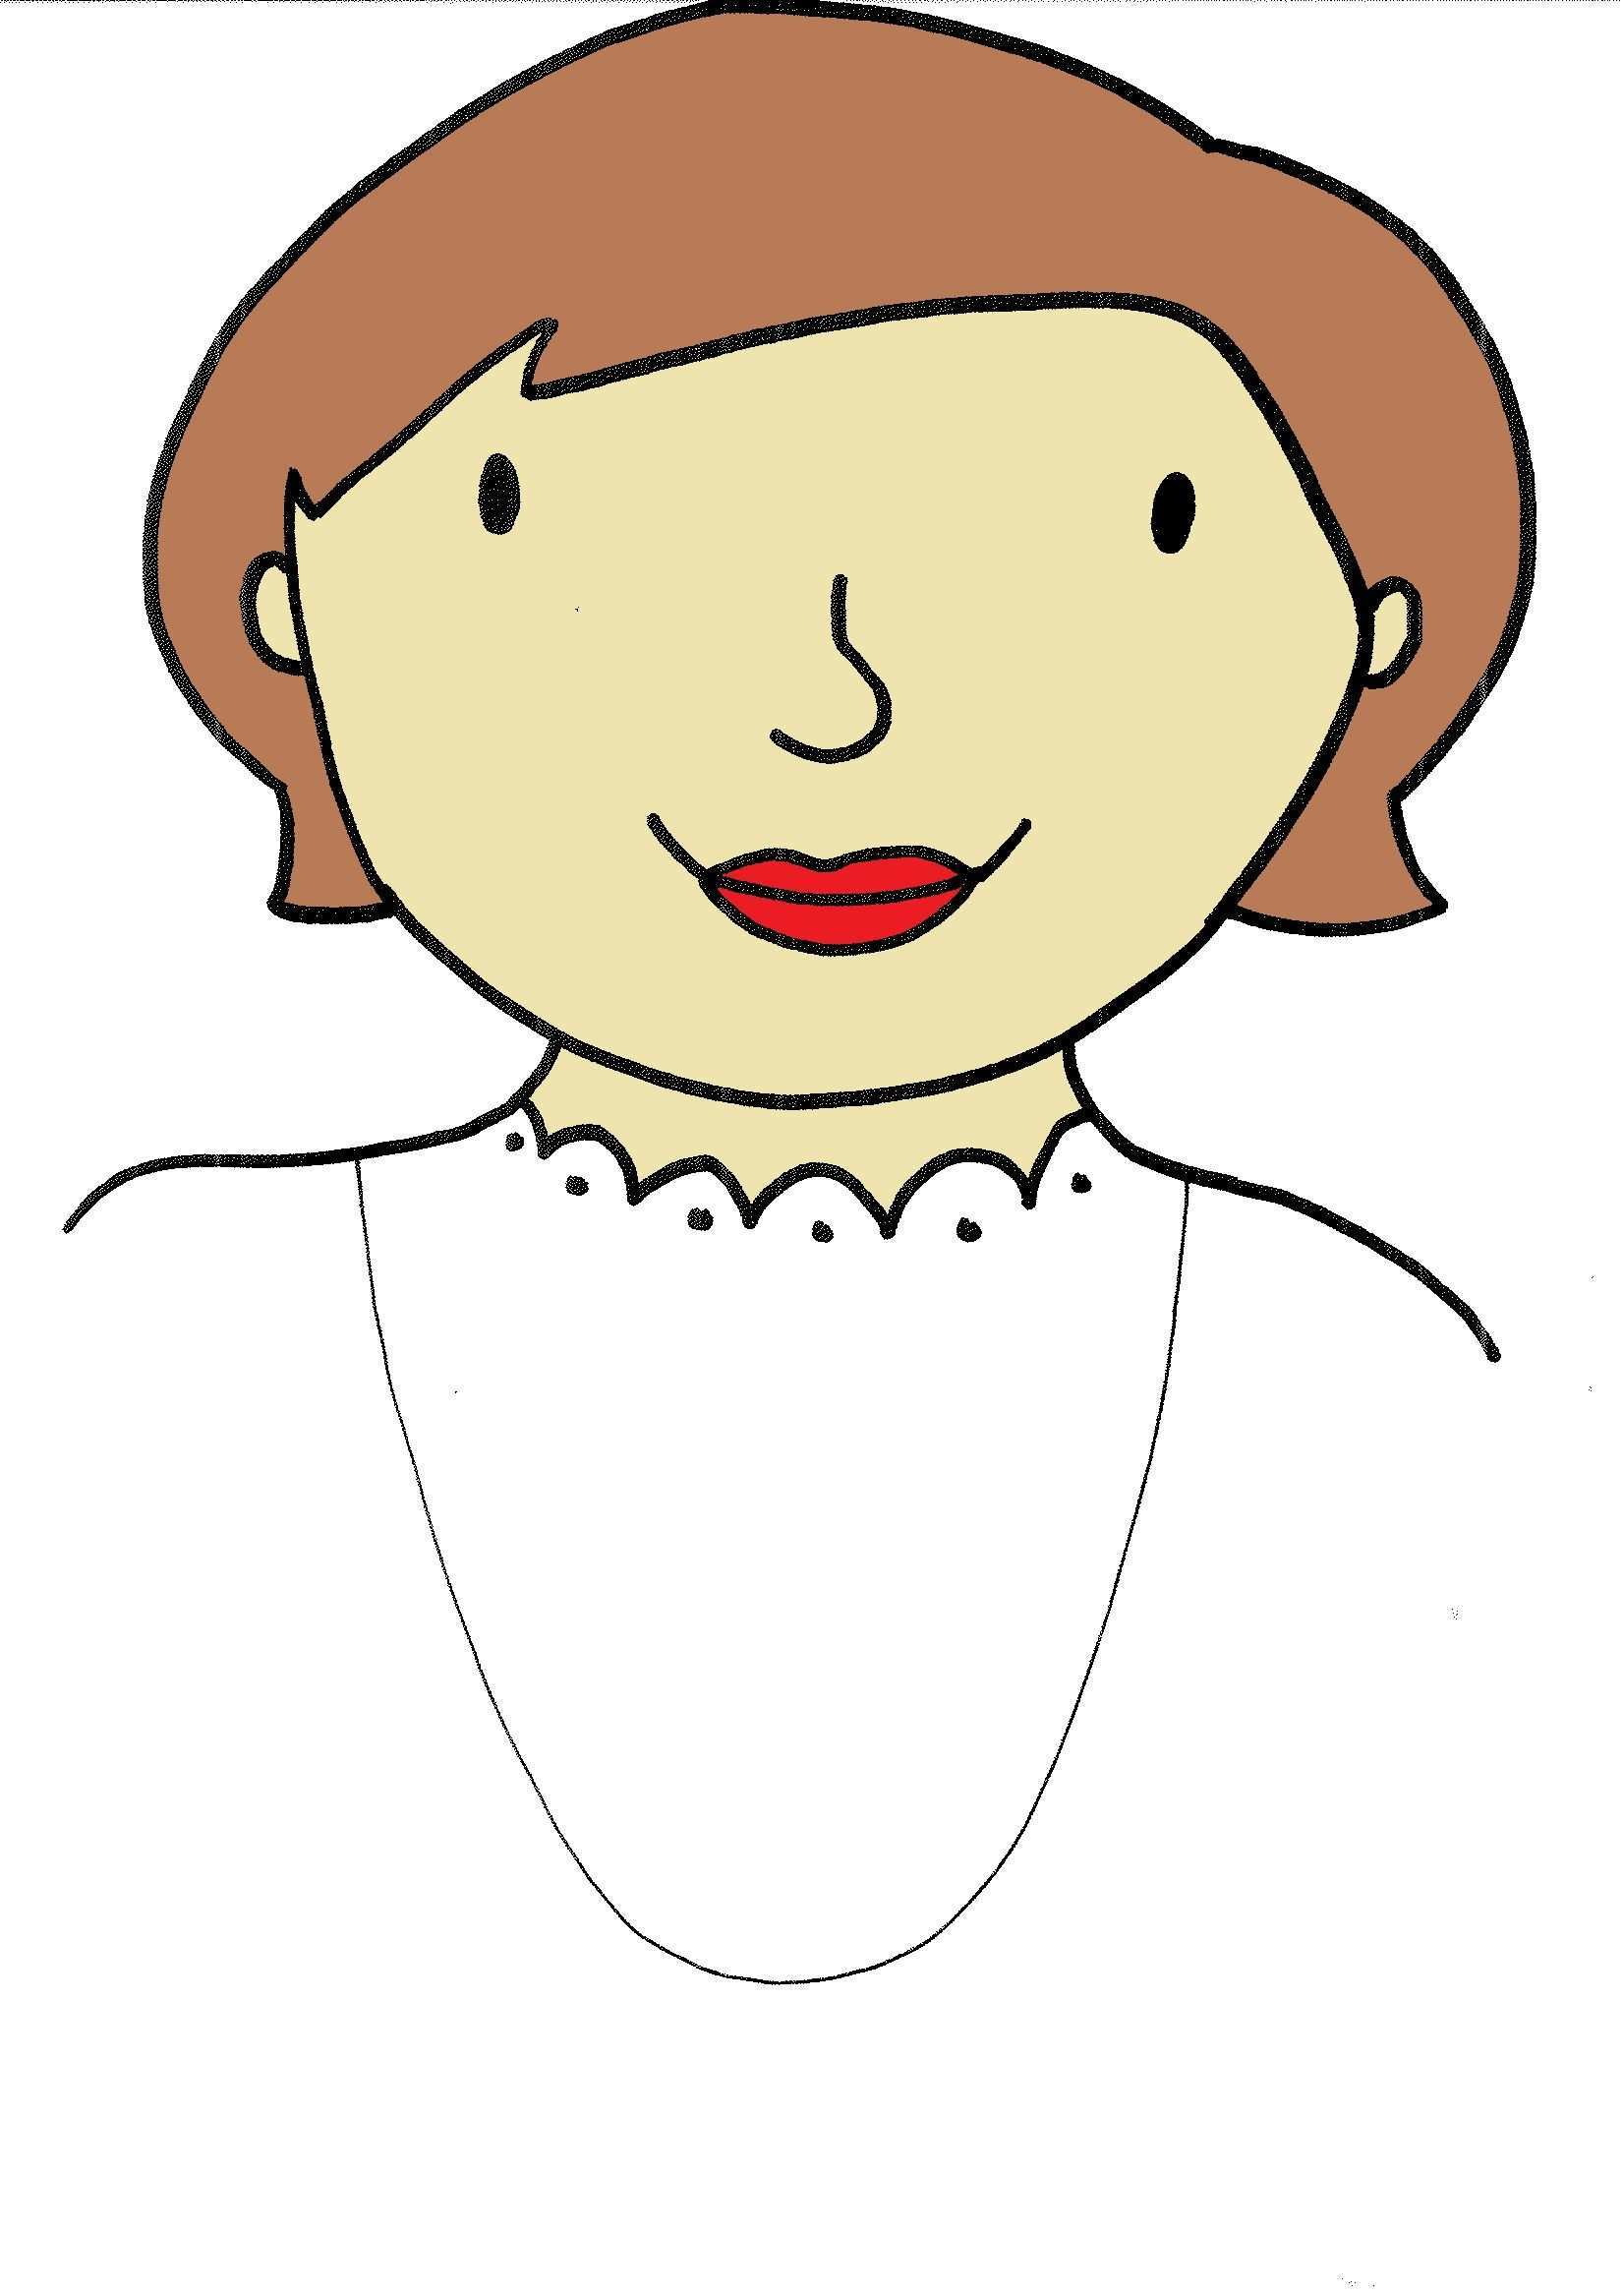 Stempelen Ketting Mama Knutselen Thema Moederdag Moederdagideeen Moederdag